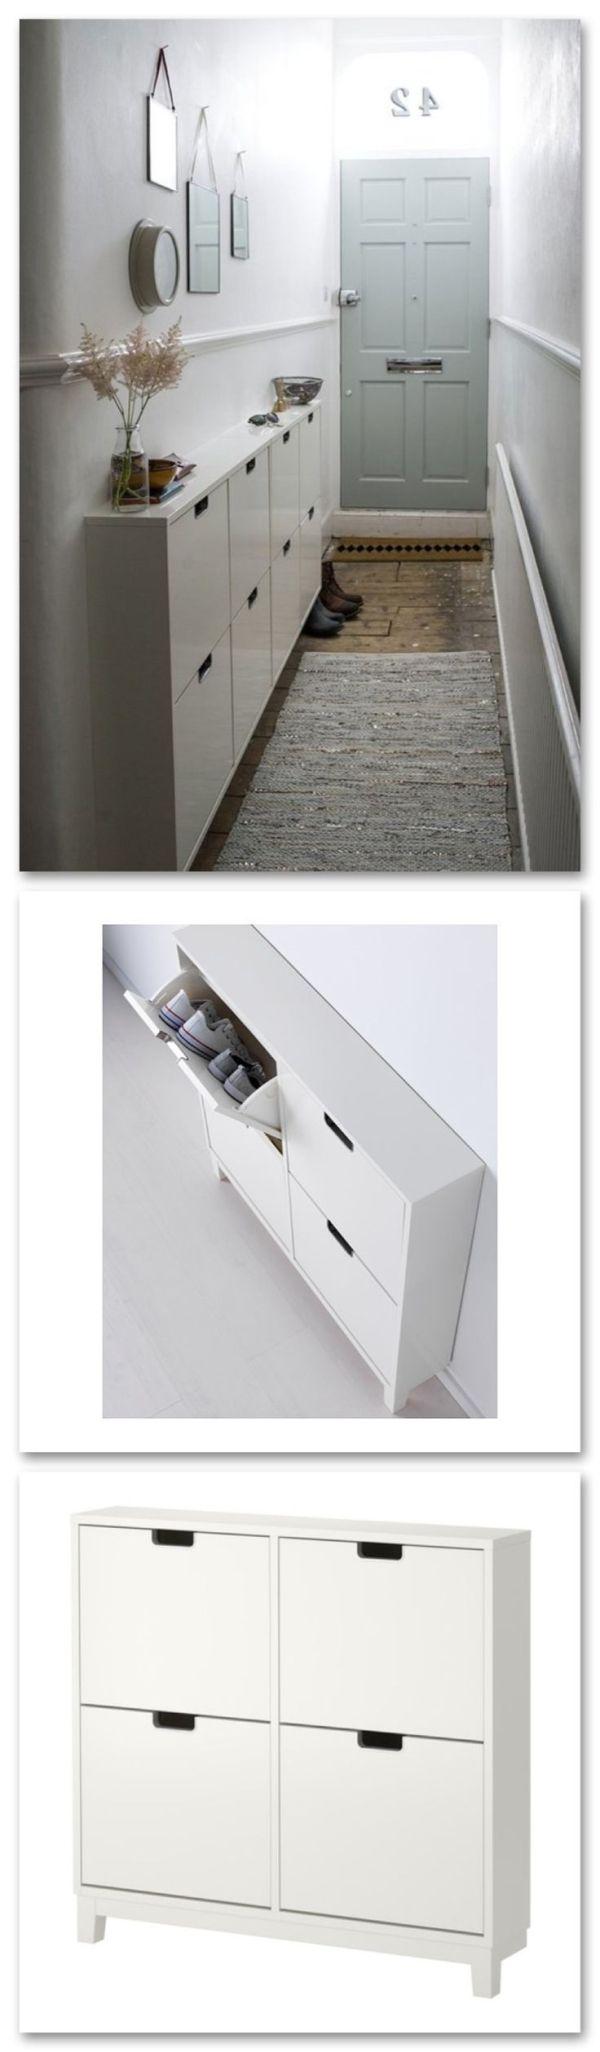 bedroom storage ideas 14 Best ideas about